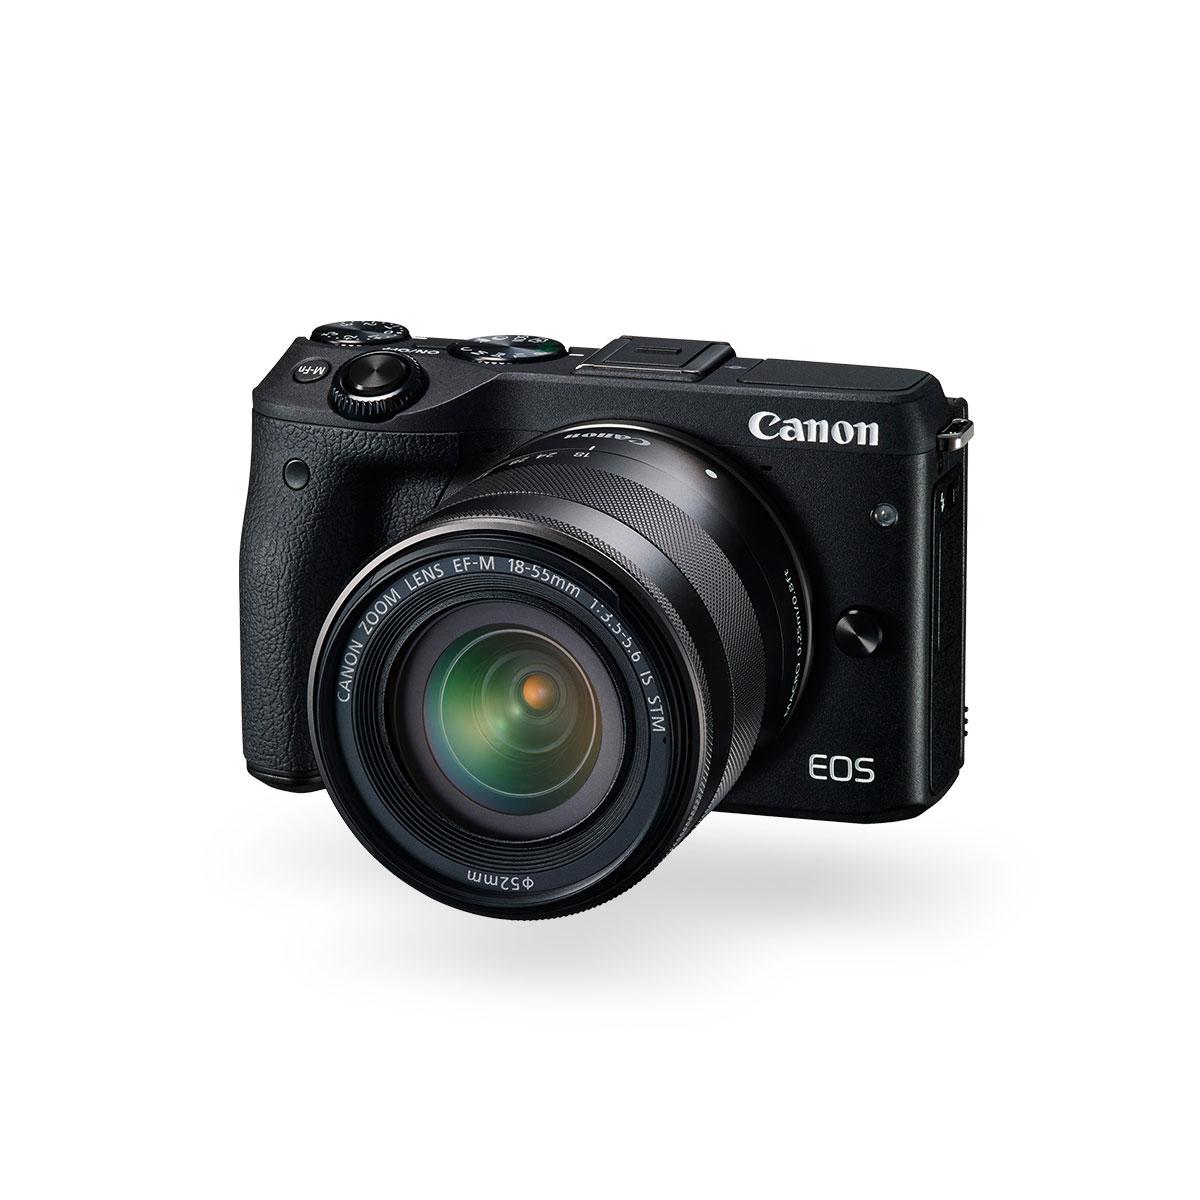 Canon EOS M3 compact camera